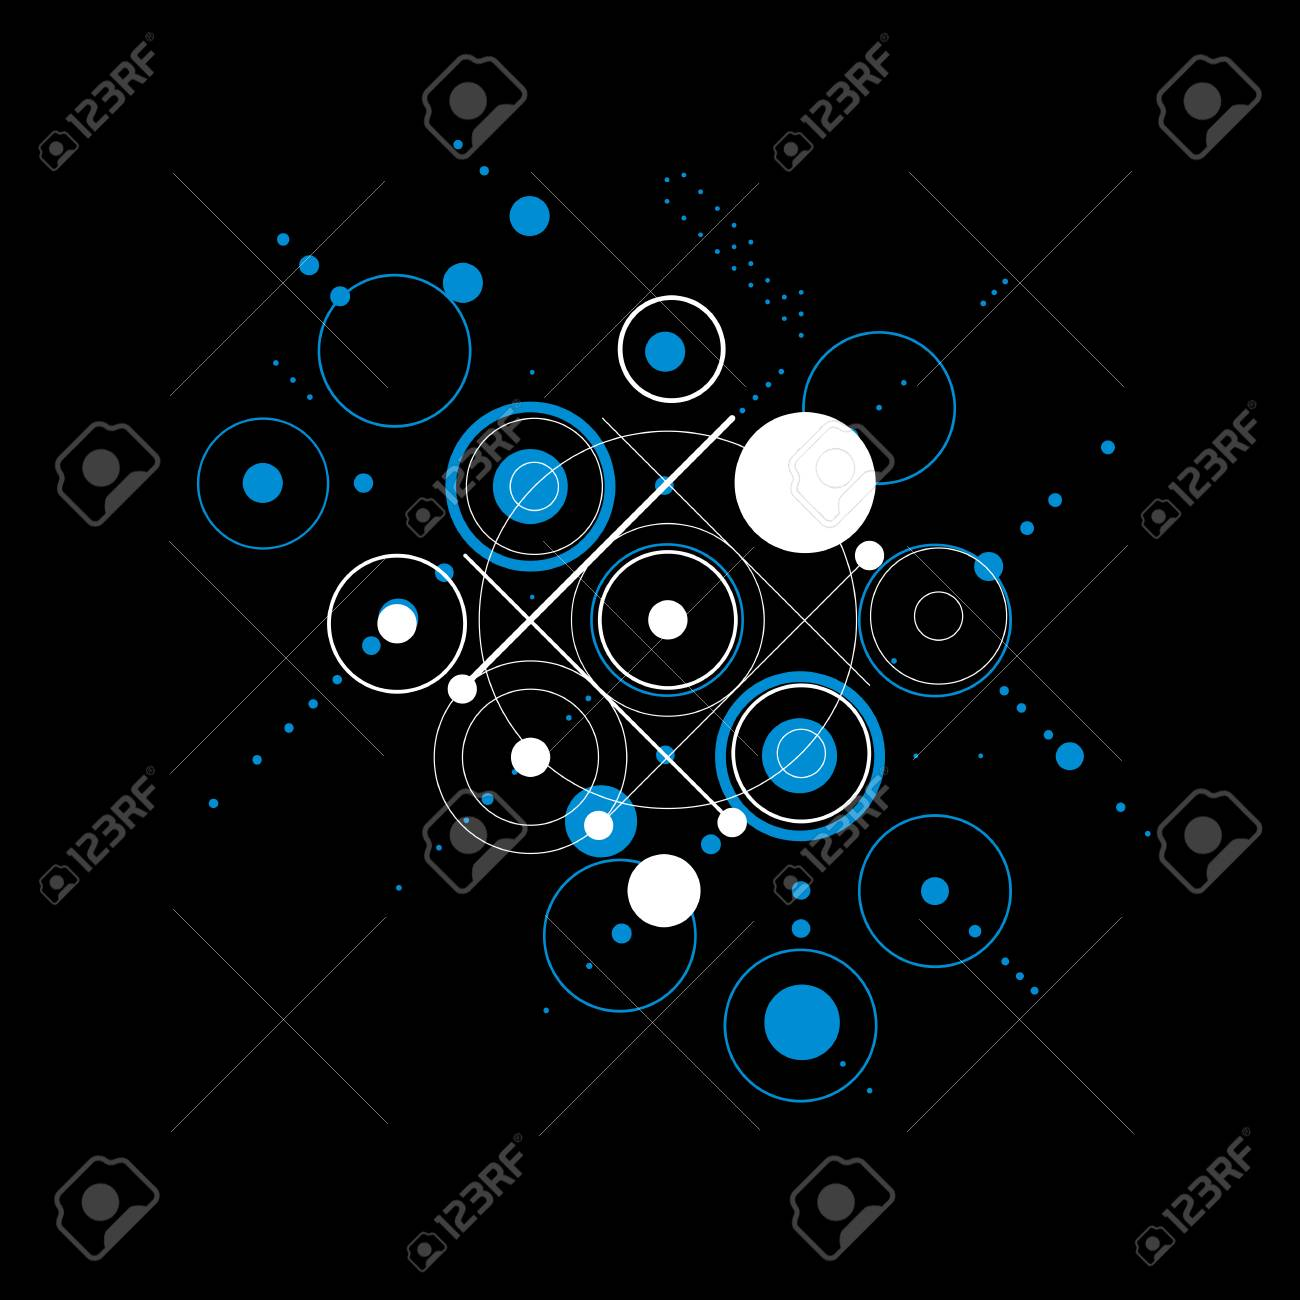 Bauhaus art composition, decorative modular blue and black vector..